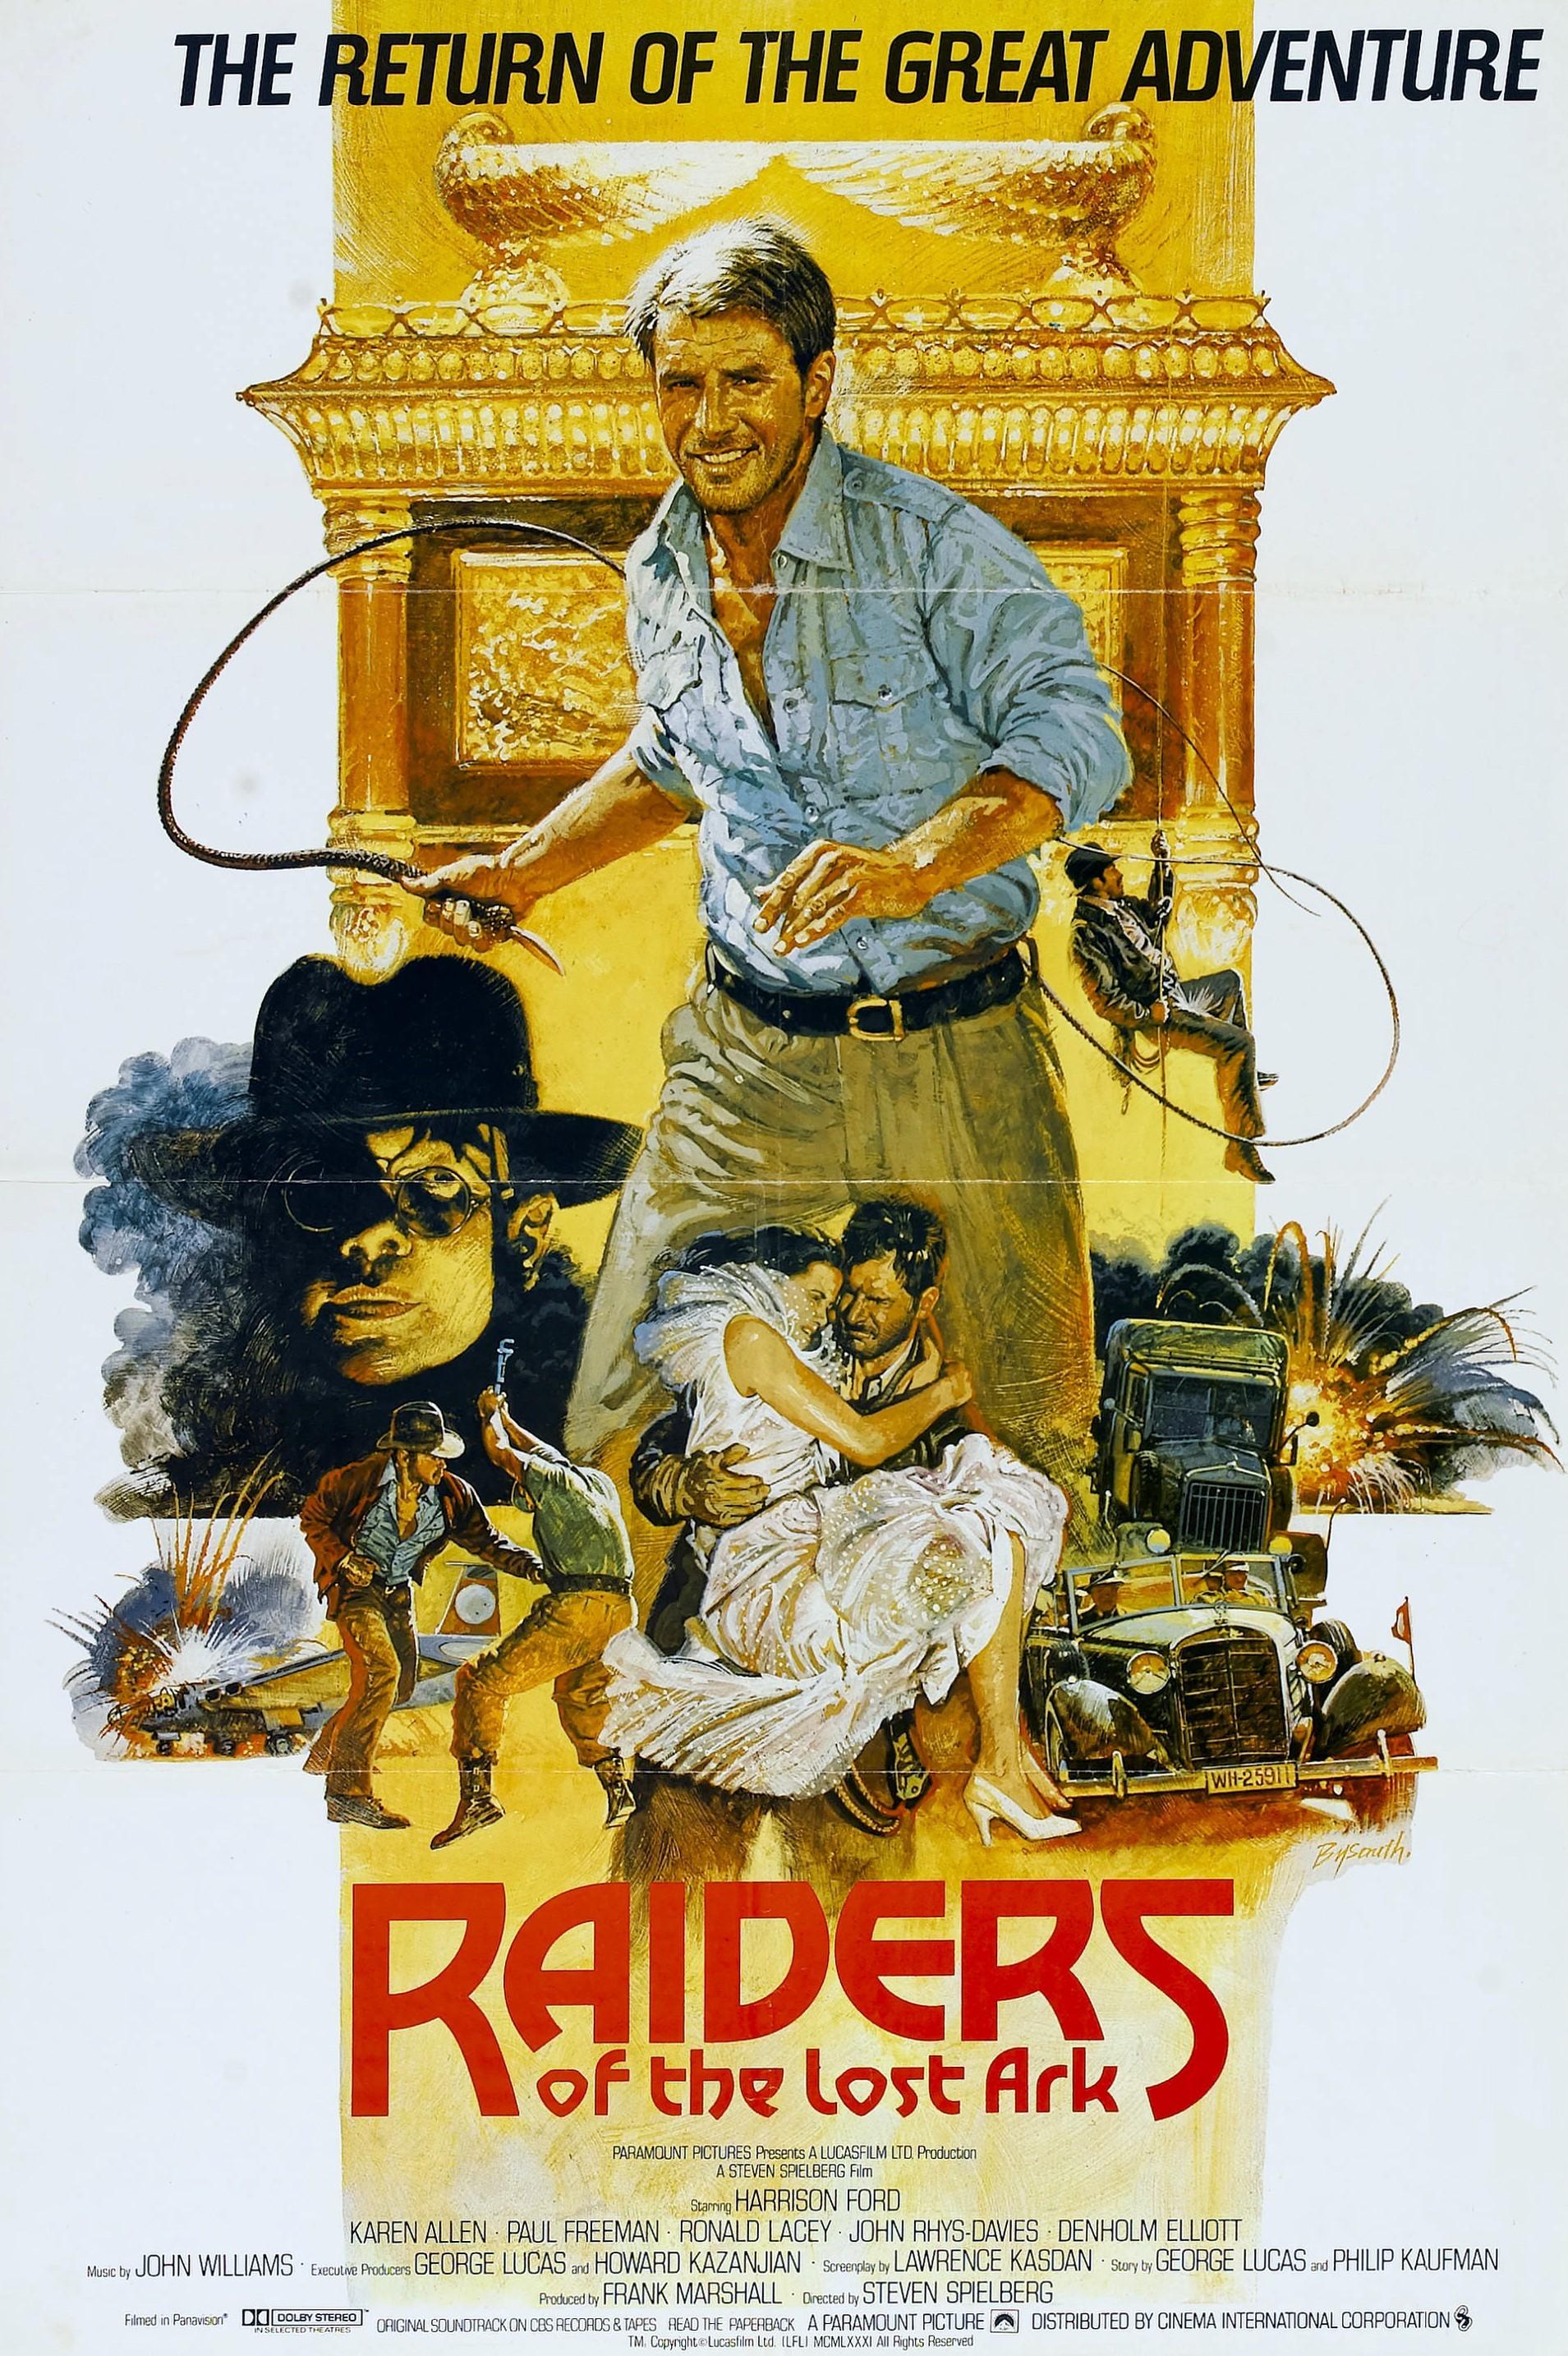 Raiders of the Lost Ark alternate poster